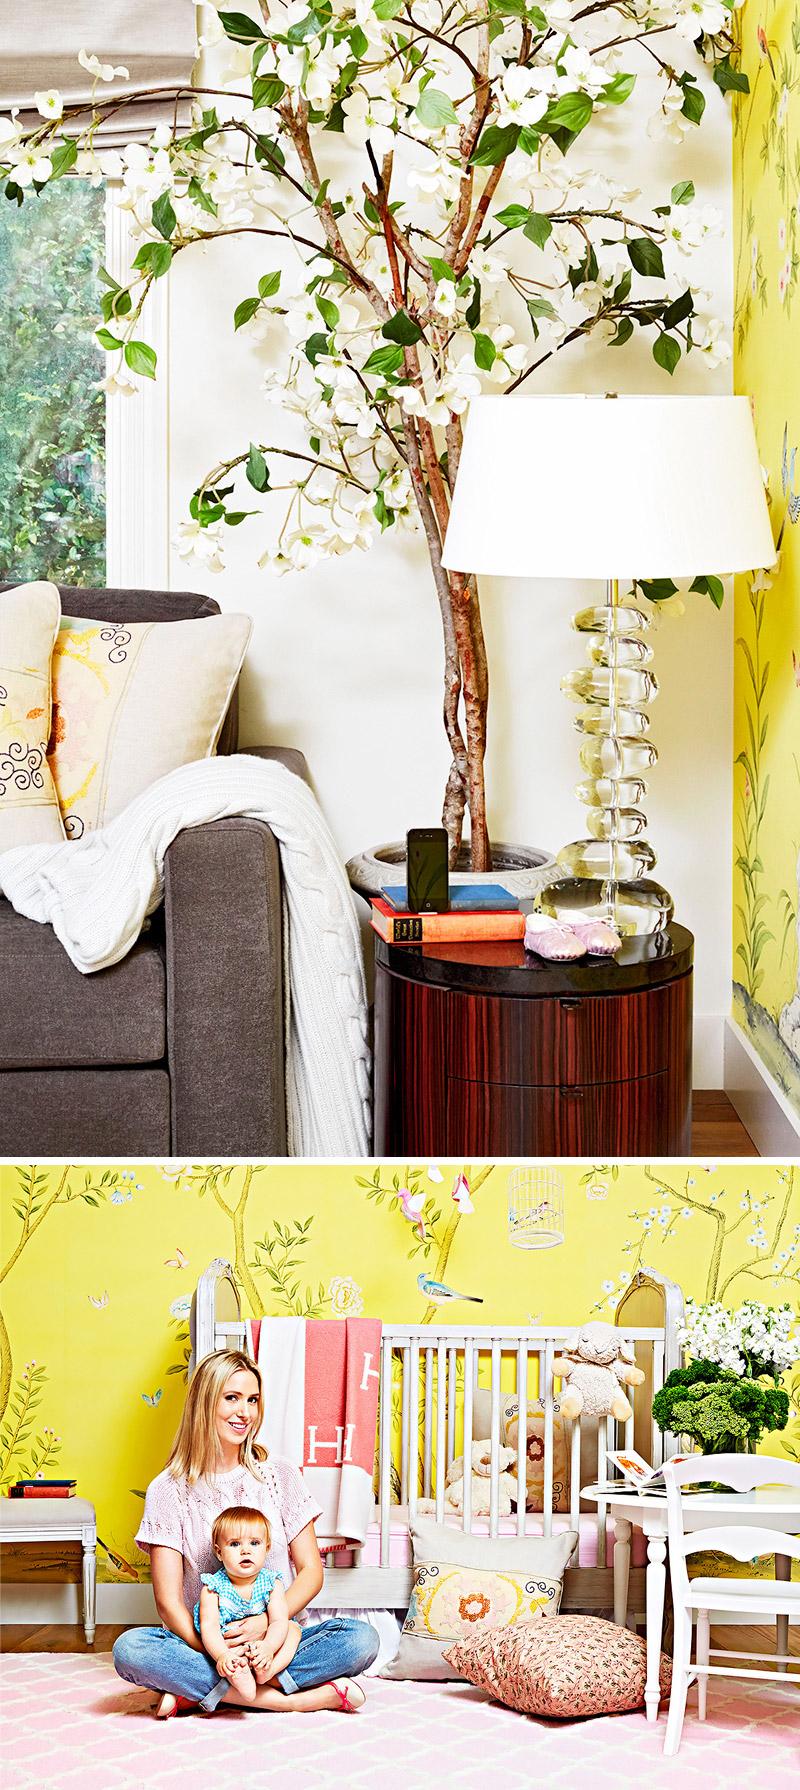 living-gazette-barbara-resende-decor-quarto-bebe-papel-parede-floral-amarelo-tapete-estilo-classico